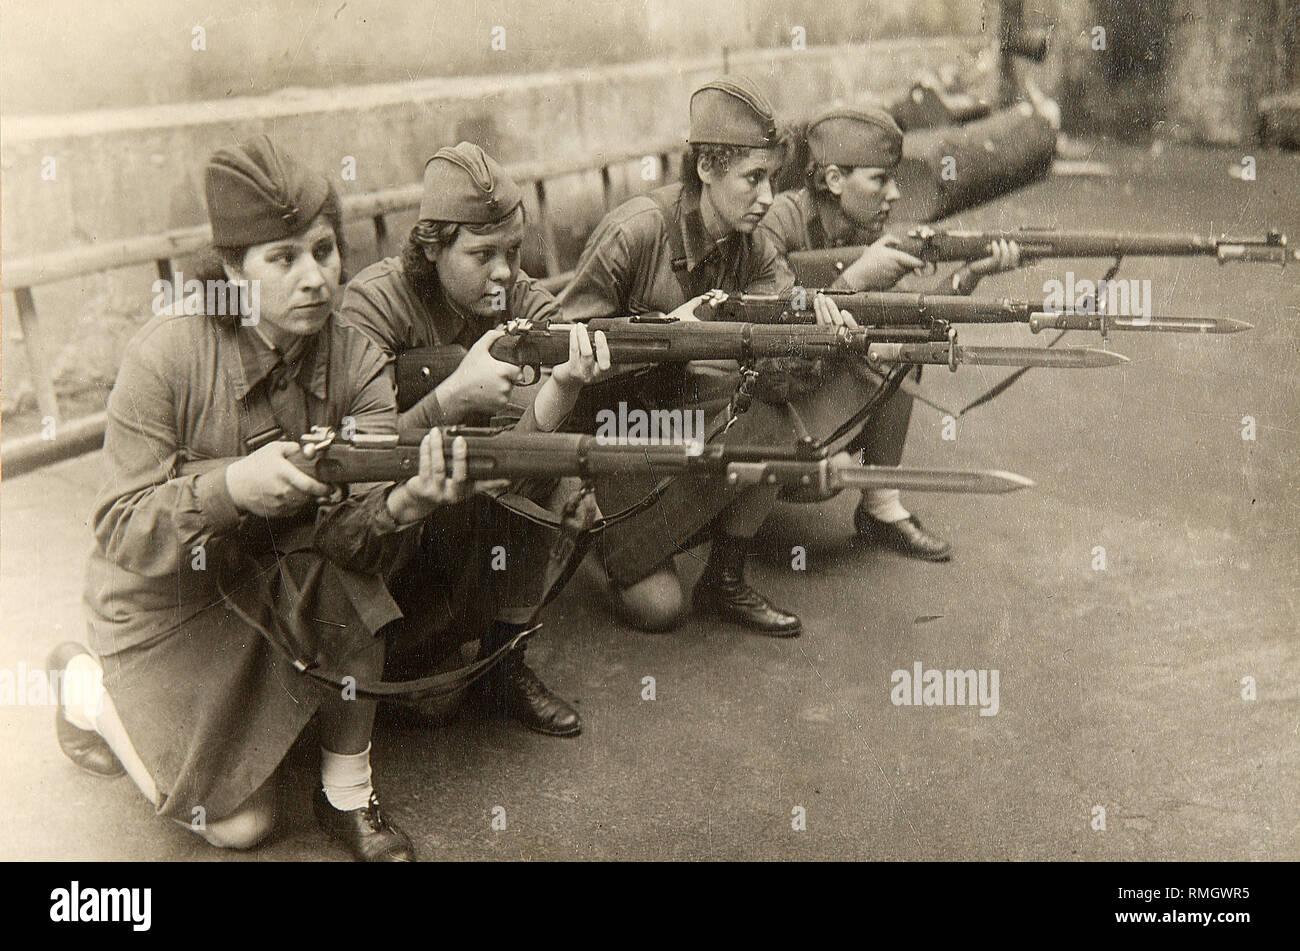 Great Patriotic War. Women Military Training. Photograph - Stock Image